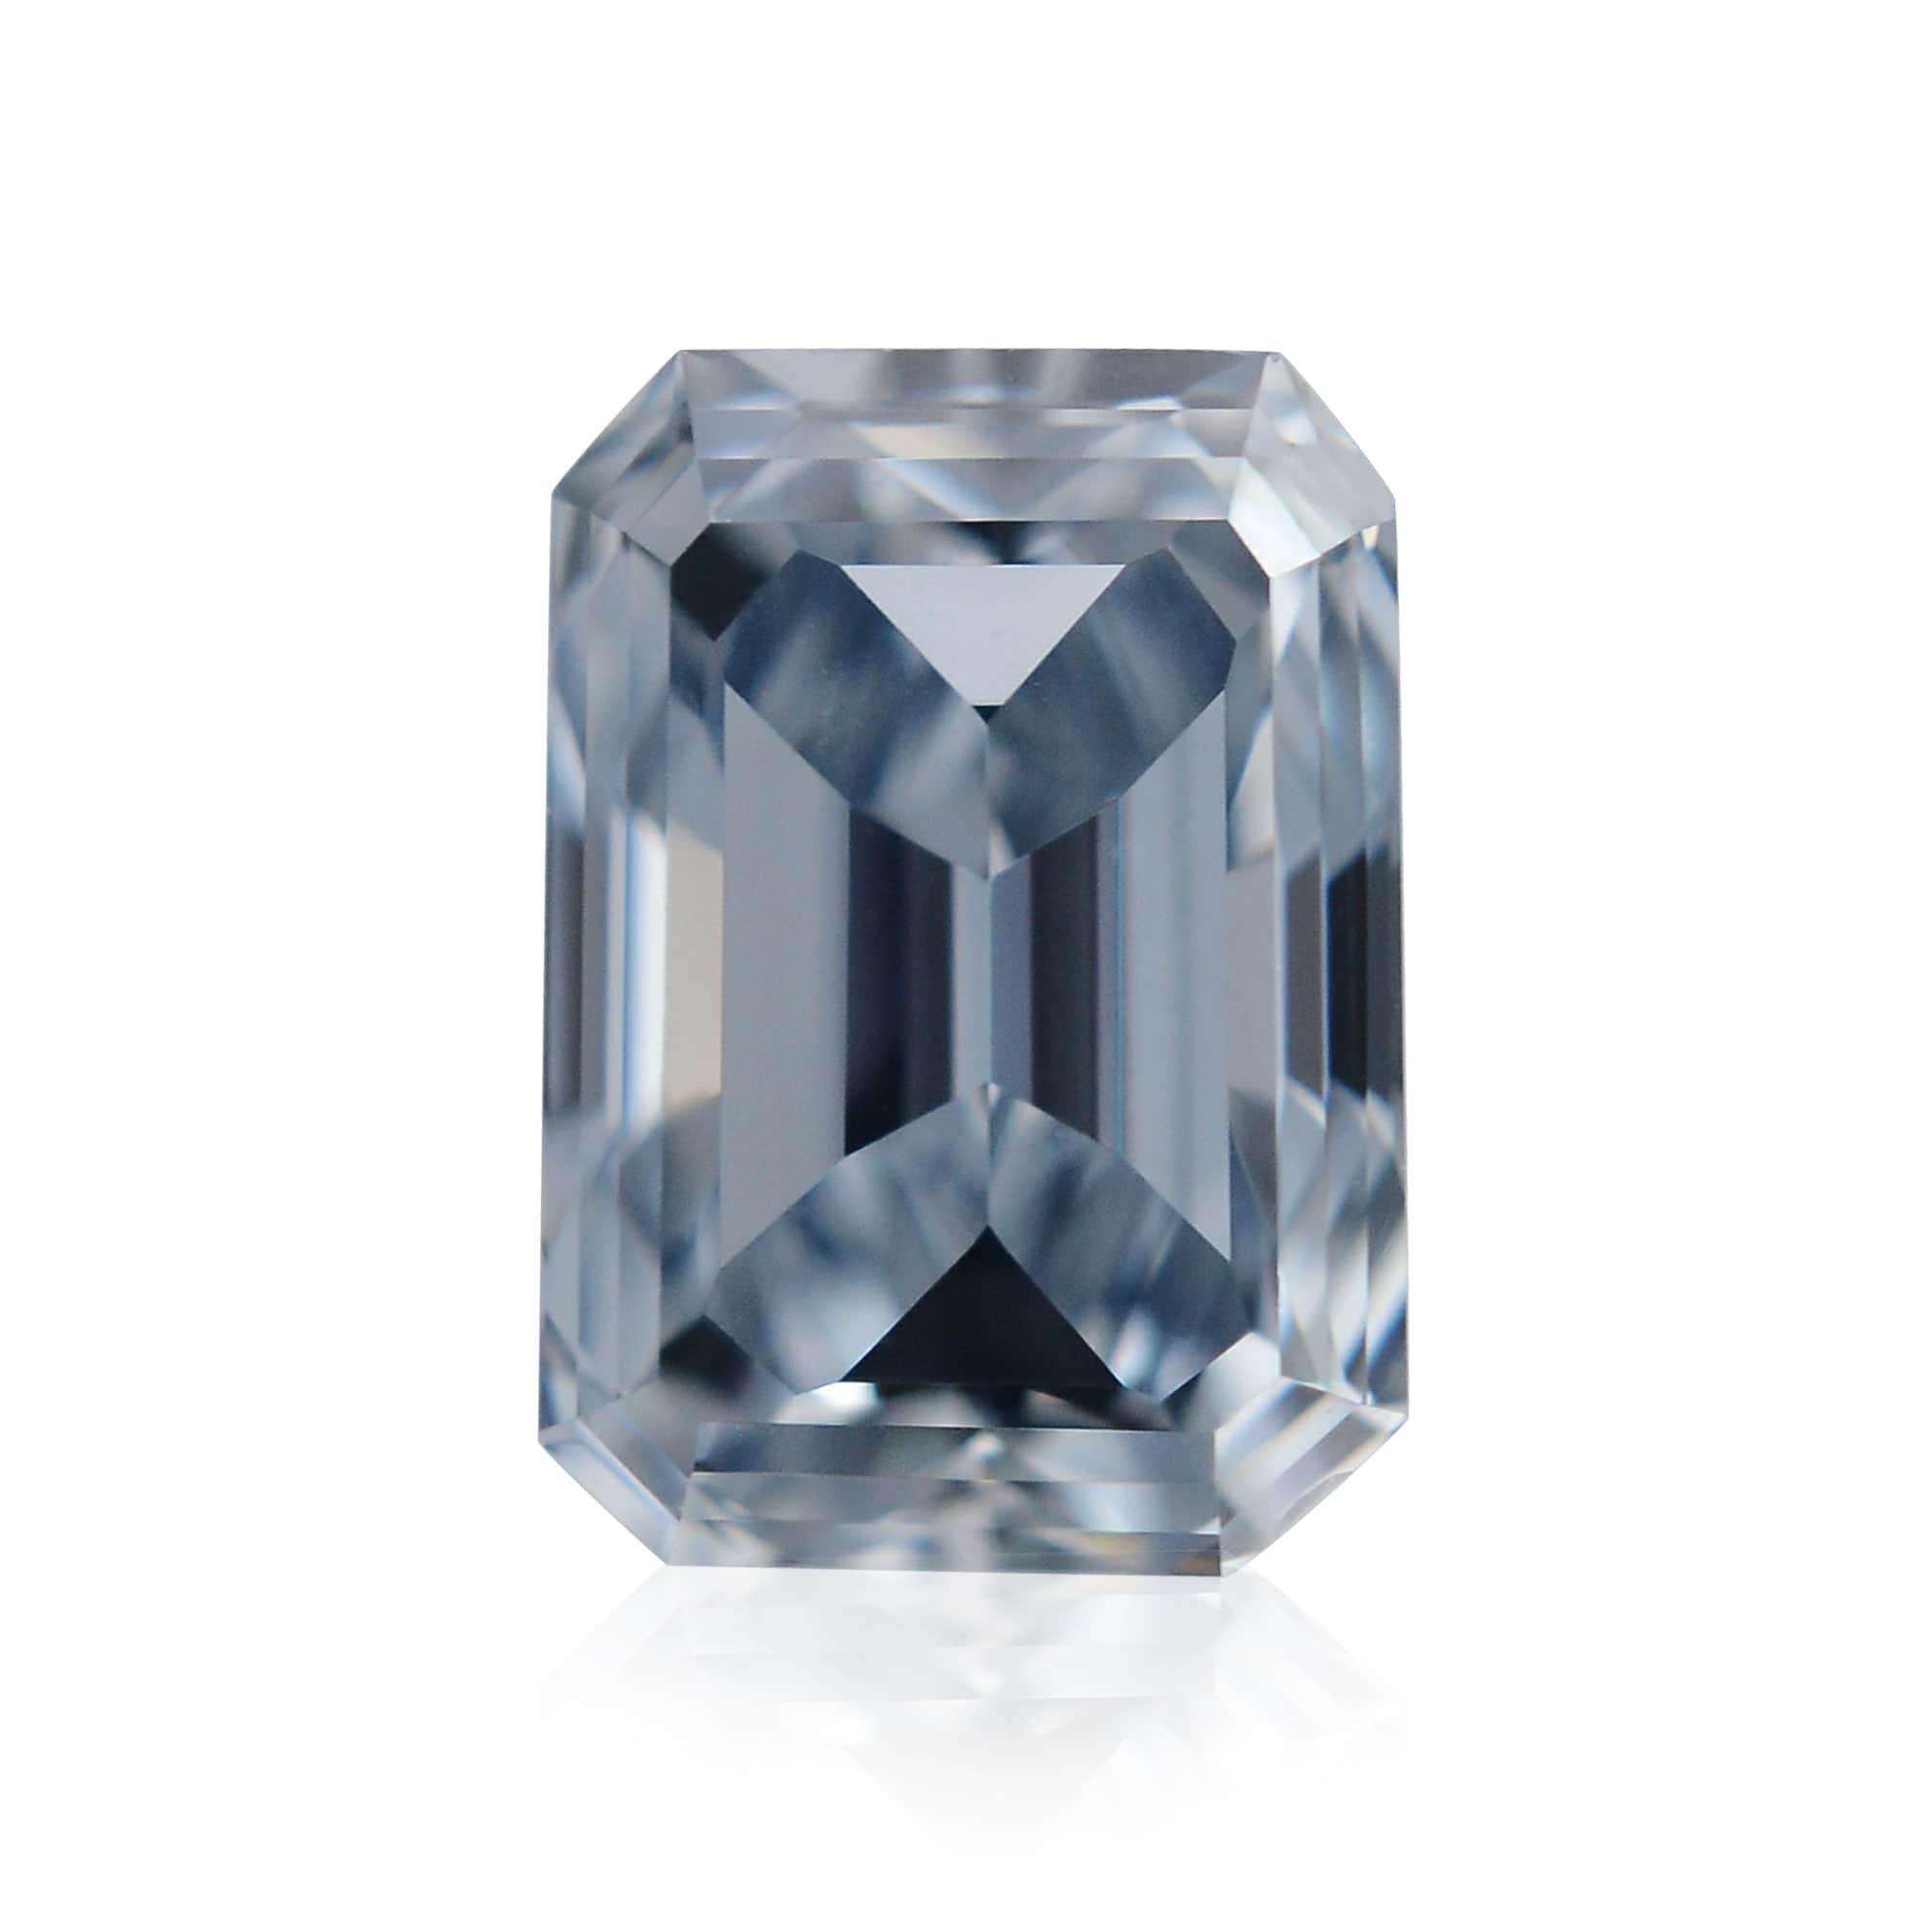 0.50 carat, Fancy Intense Blue Diamond, Emerald Shape, VS1 Clarity, GIA, SKU 328608